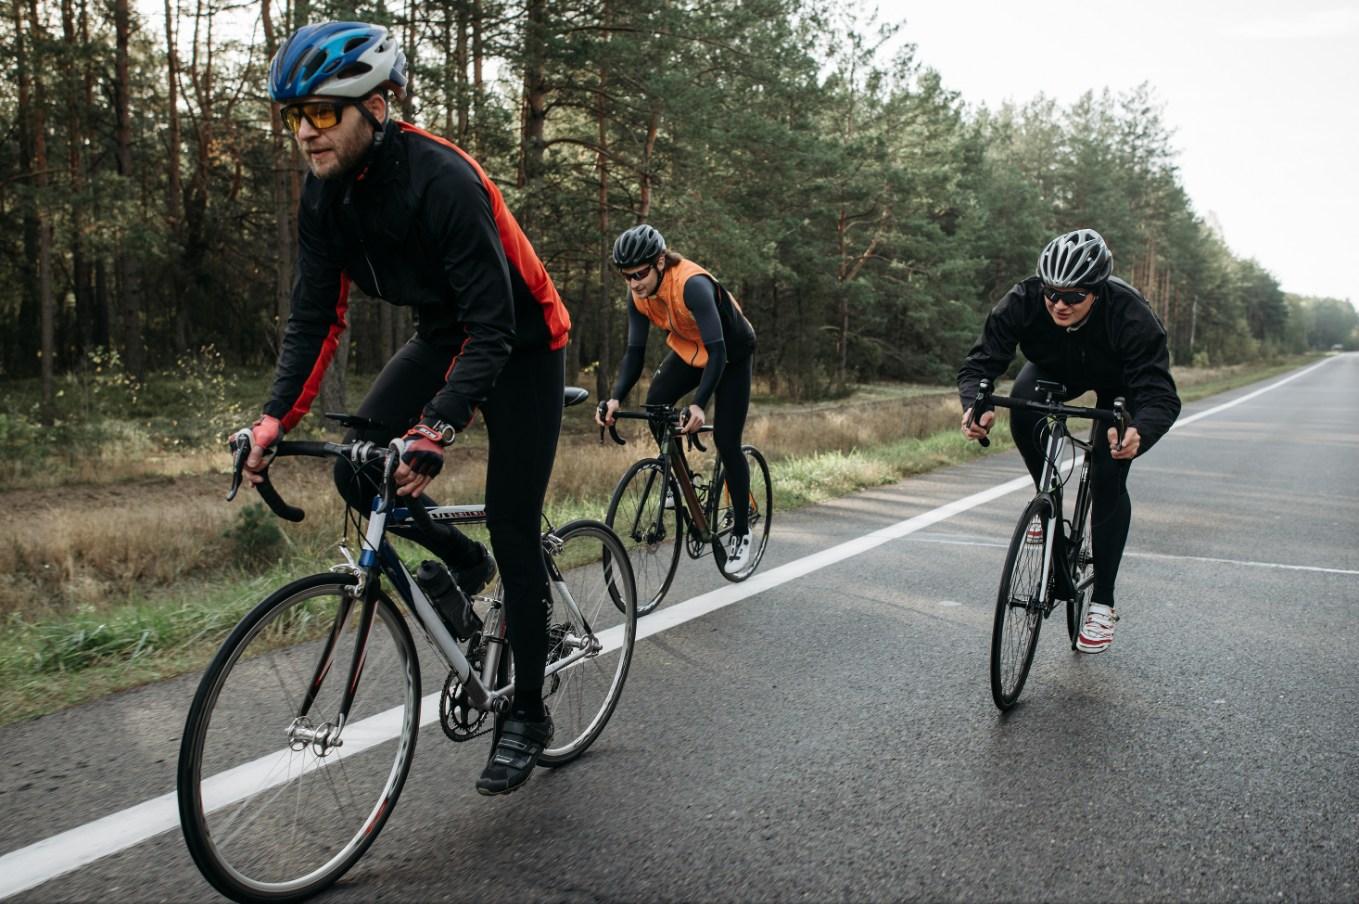 snackenglish, snack, chug, esfuerzo, trabajo, bicicleta, bicycle, hill